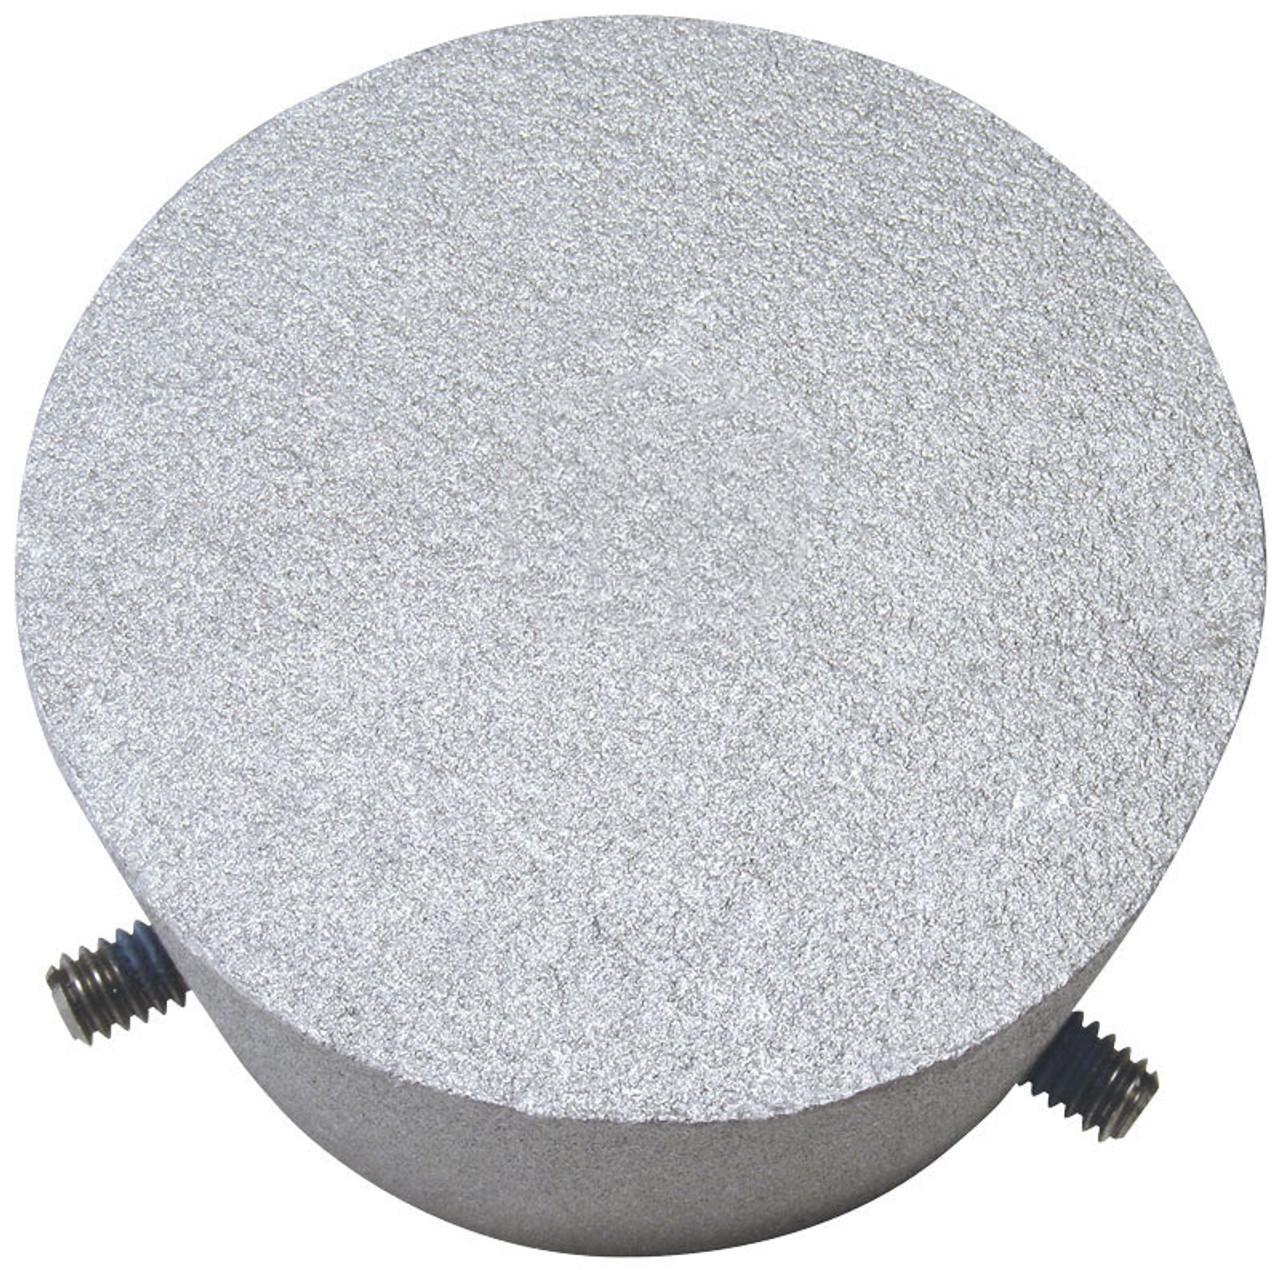 Pole Top Caps